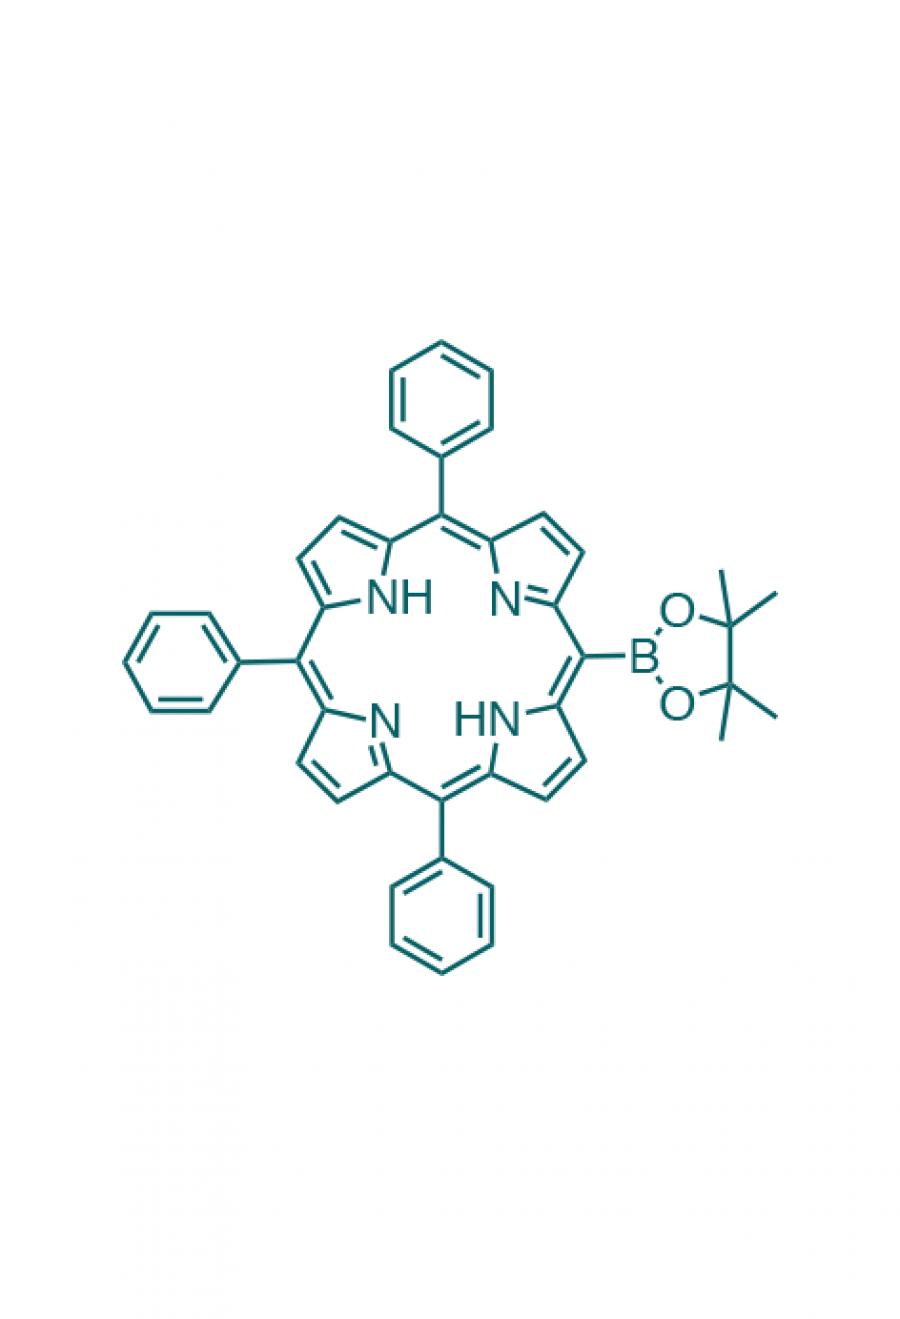 5,10,15-(triphenyl)-20-(4,4,5,5-tetramethyl-1,3,2-dioxaborolan-2-yl)porphyrin